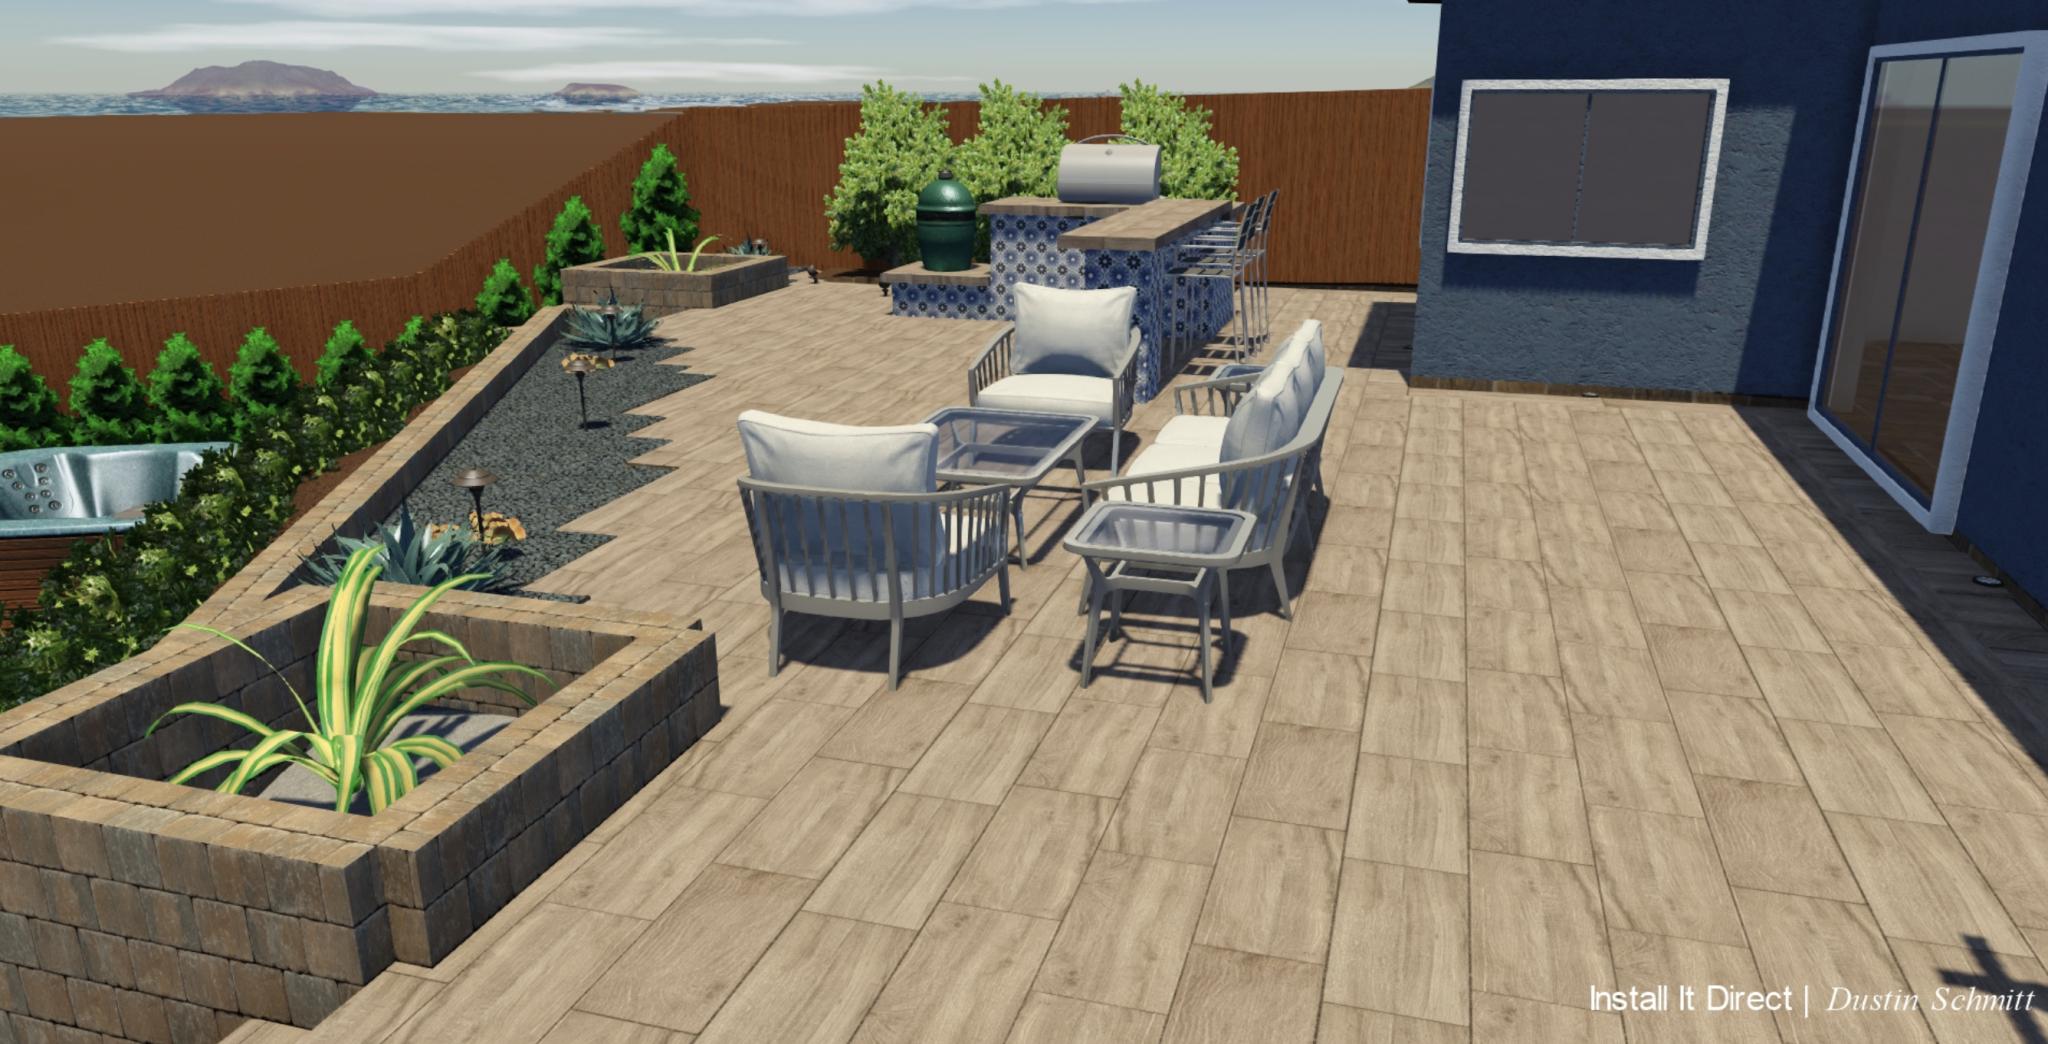 Landscape design ideas